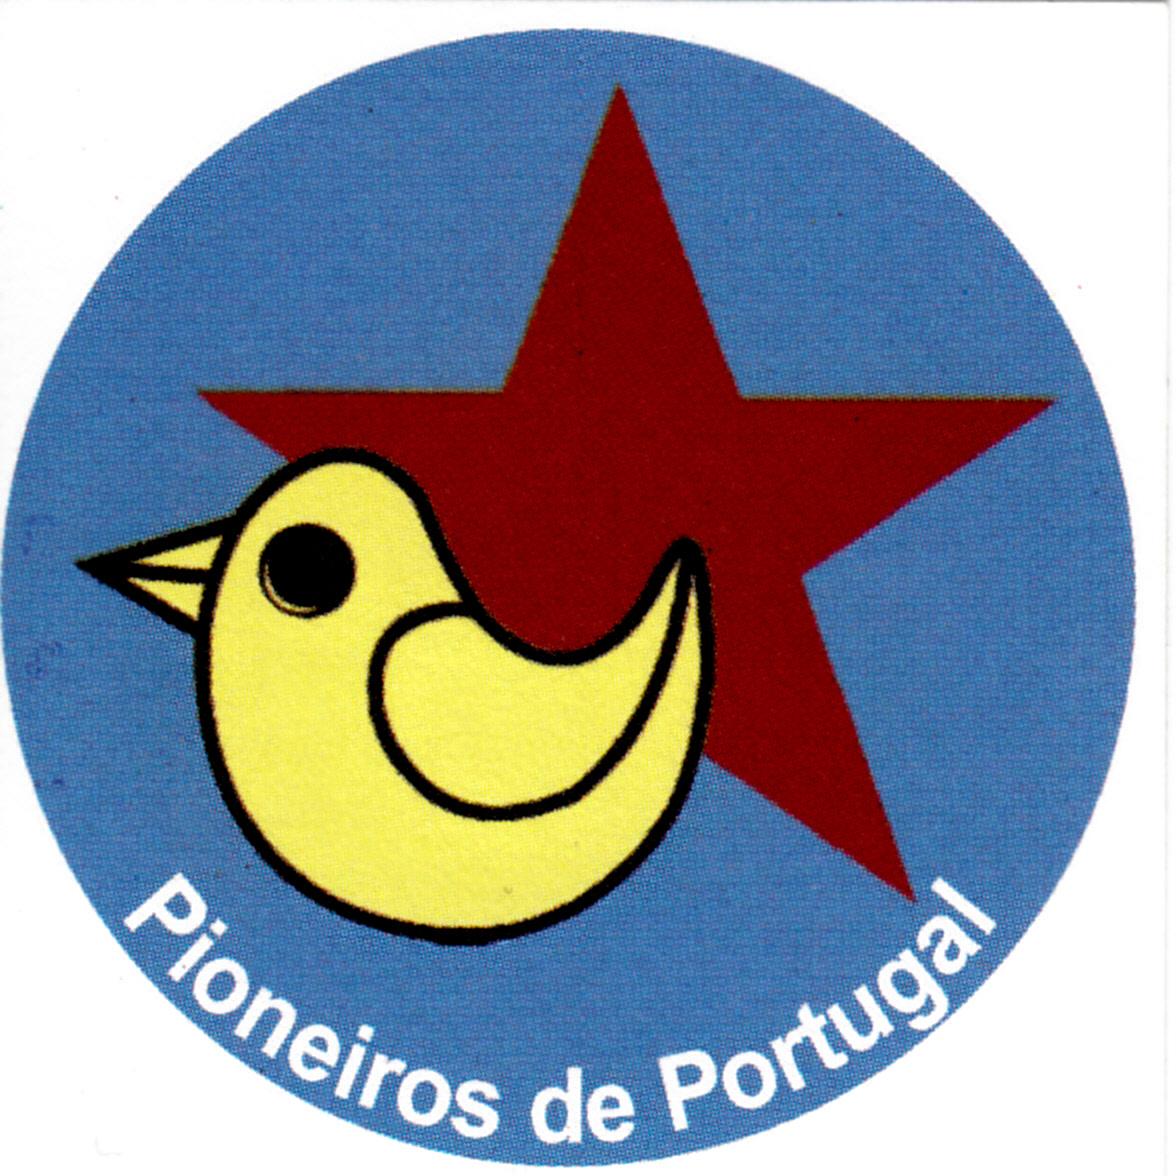 Pioneiros_autoc_2015_05_01_0003